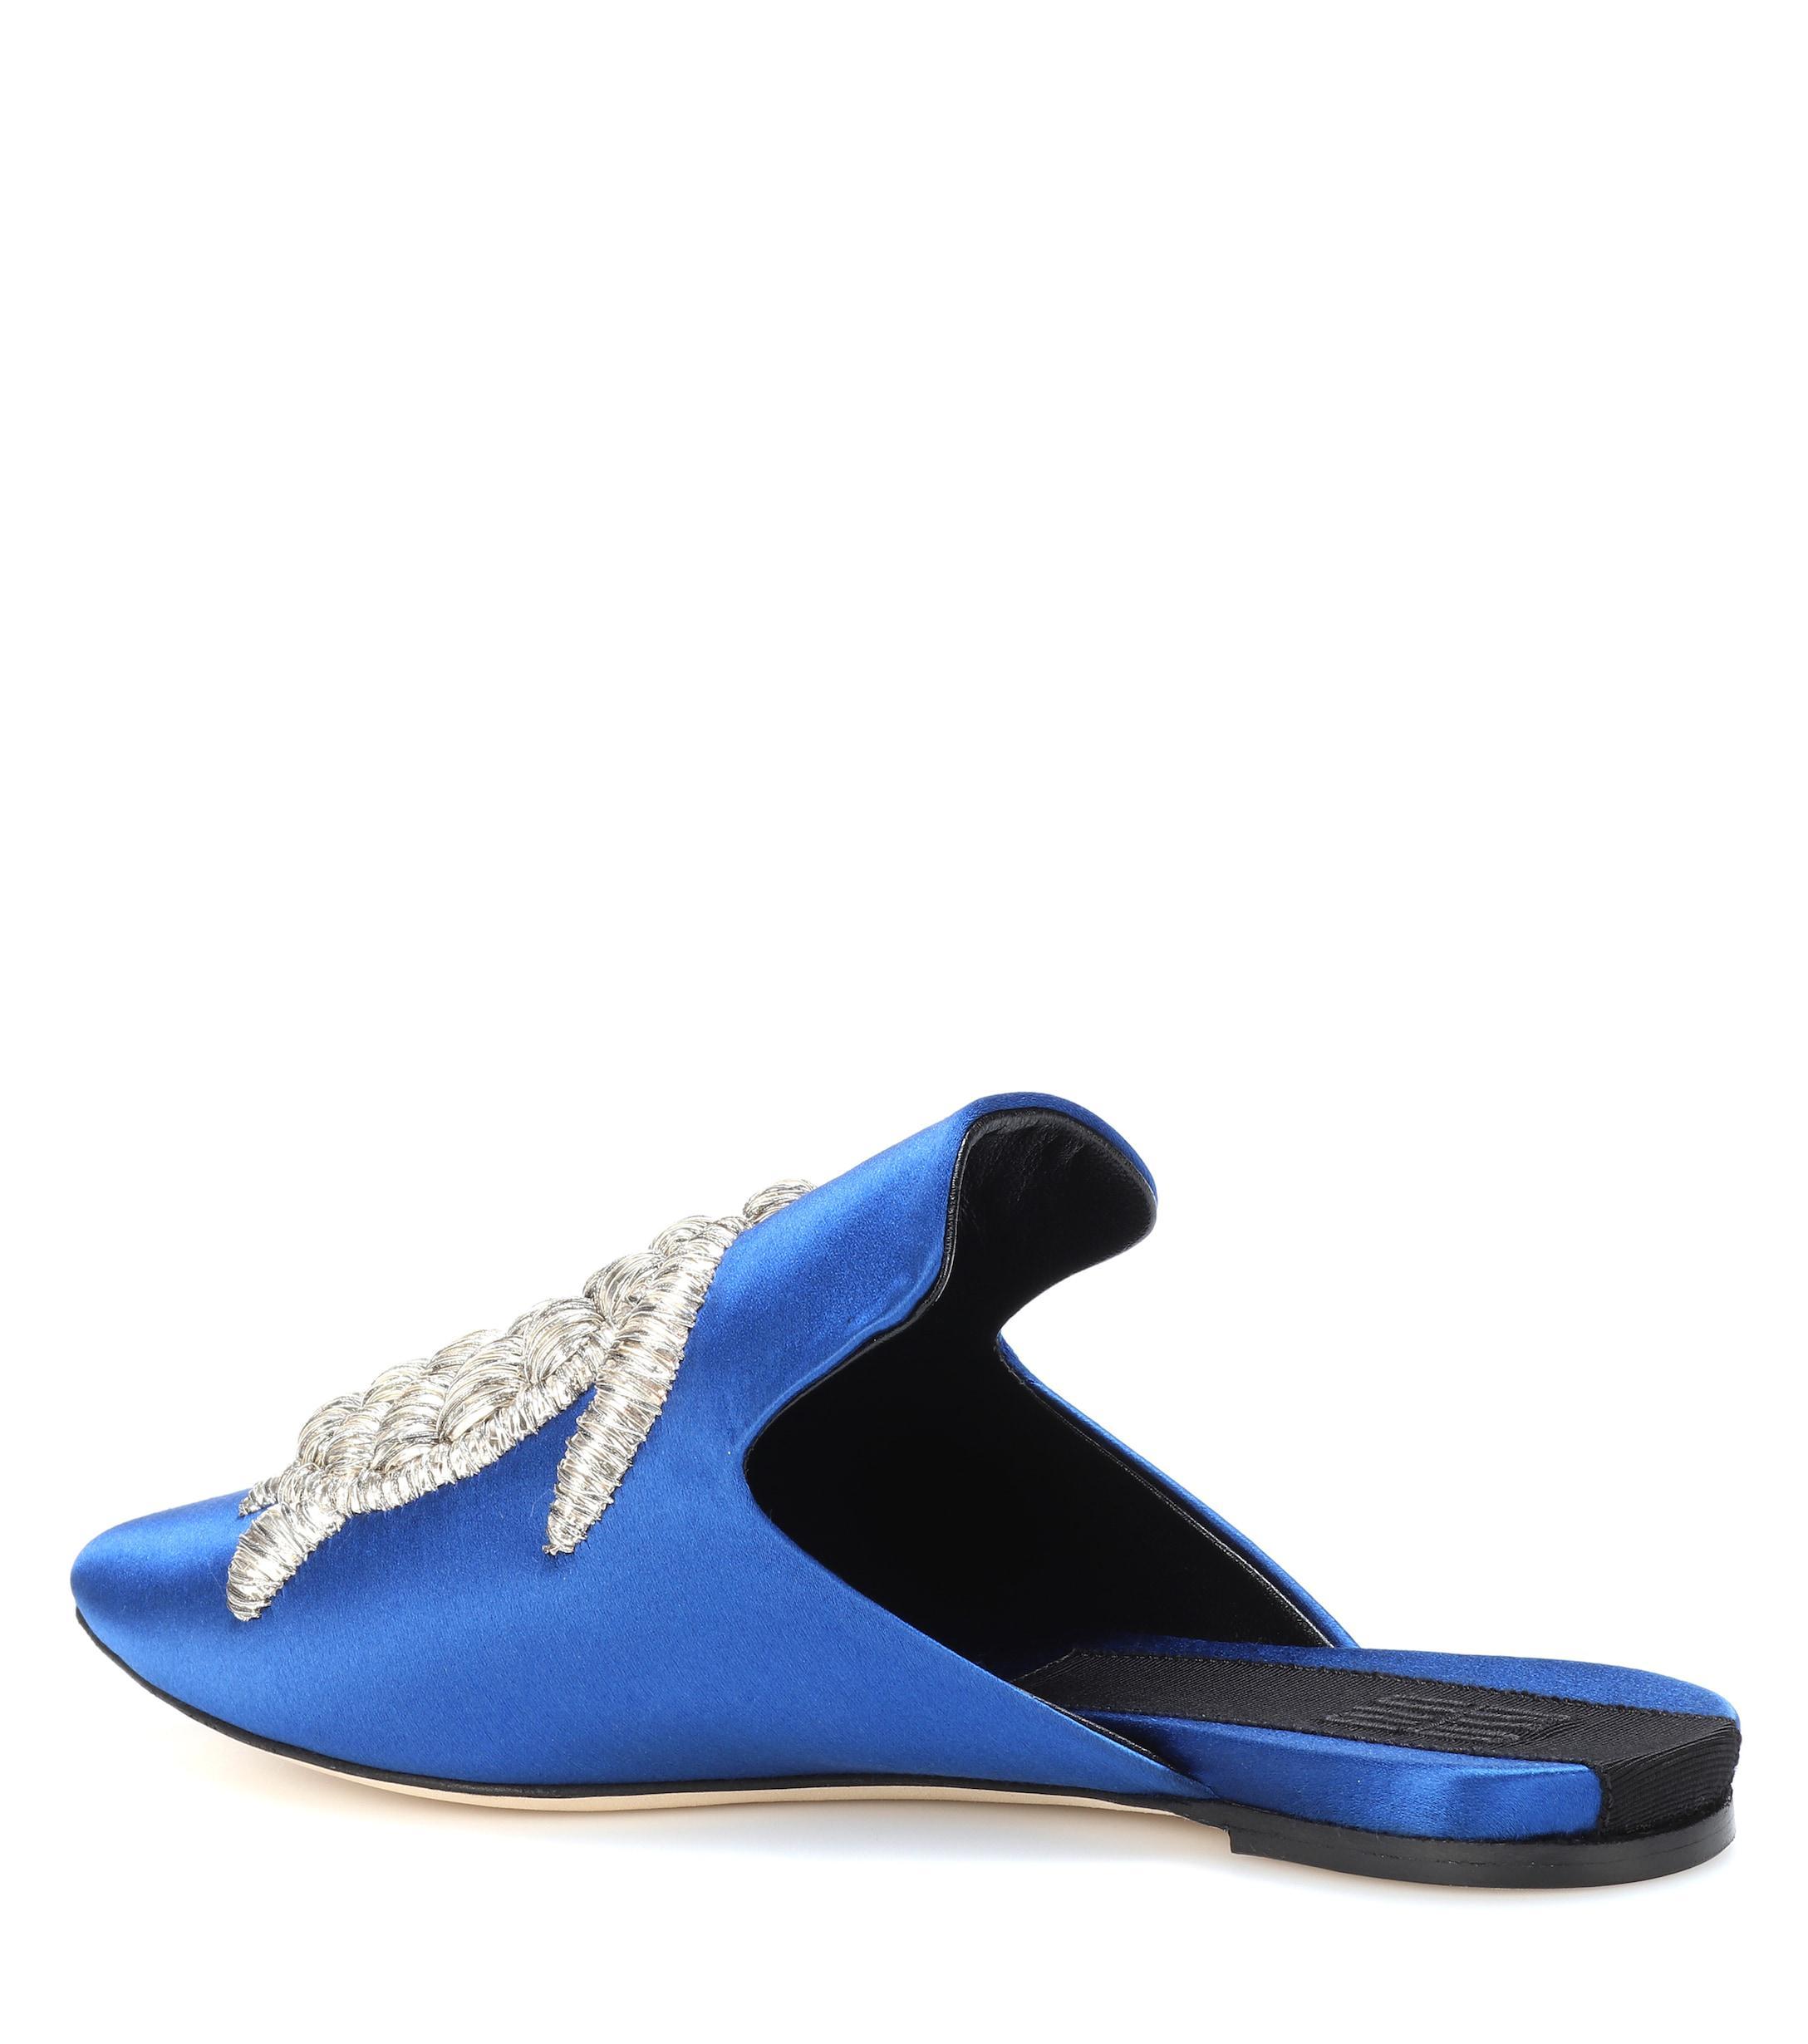 98a510e0bb9d sanayi-313-cobalt-Tartaruga-Satin-Slippers.jpeg